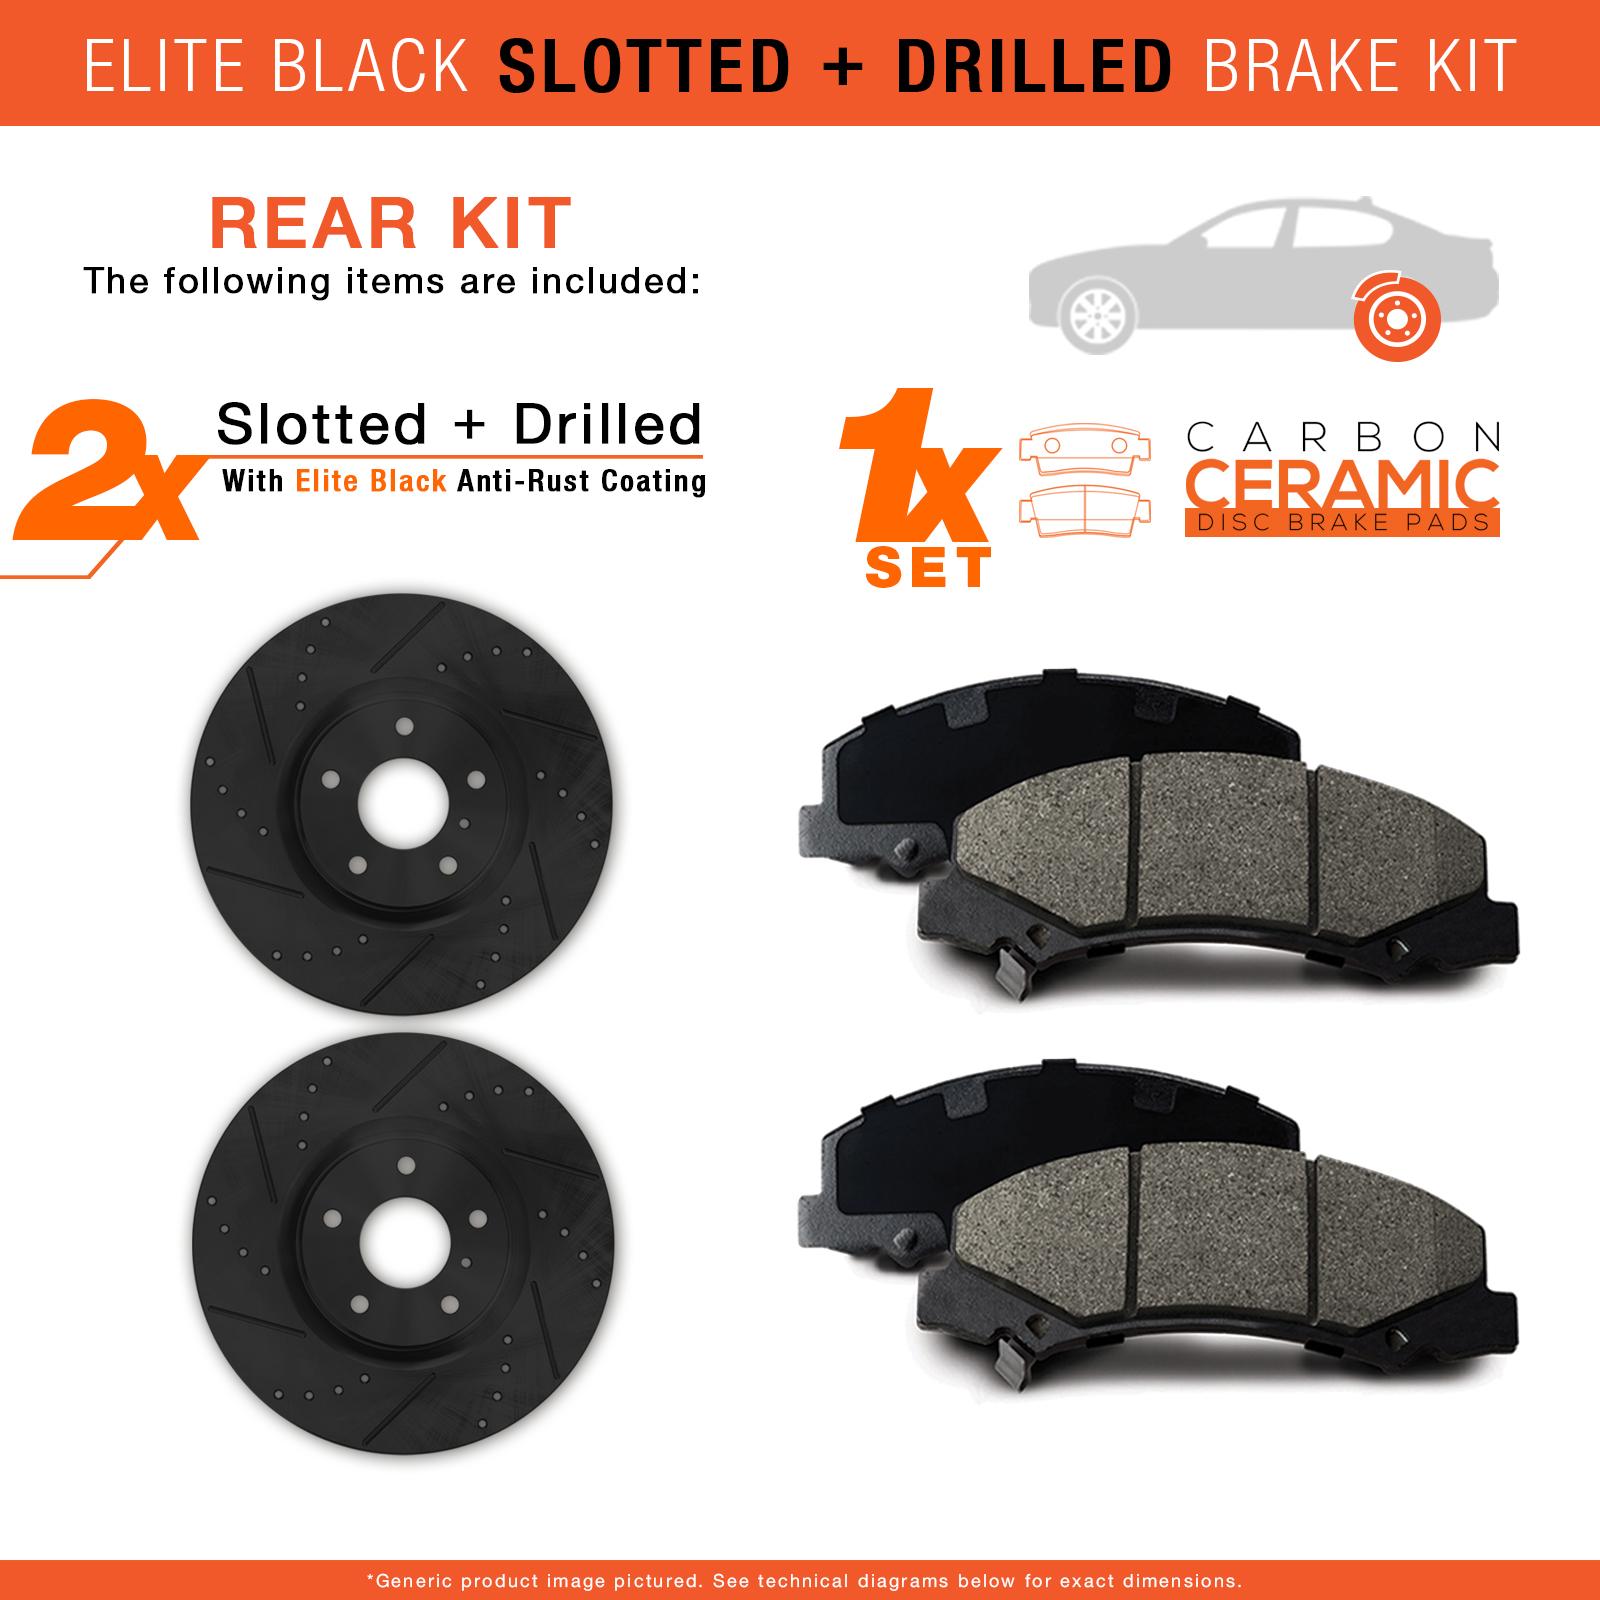 2001 Fits Hyundai Xg300 Black Slot Drill Rotor W Ceramic Pads R Ebay Wiring Diagram